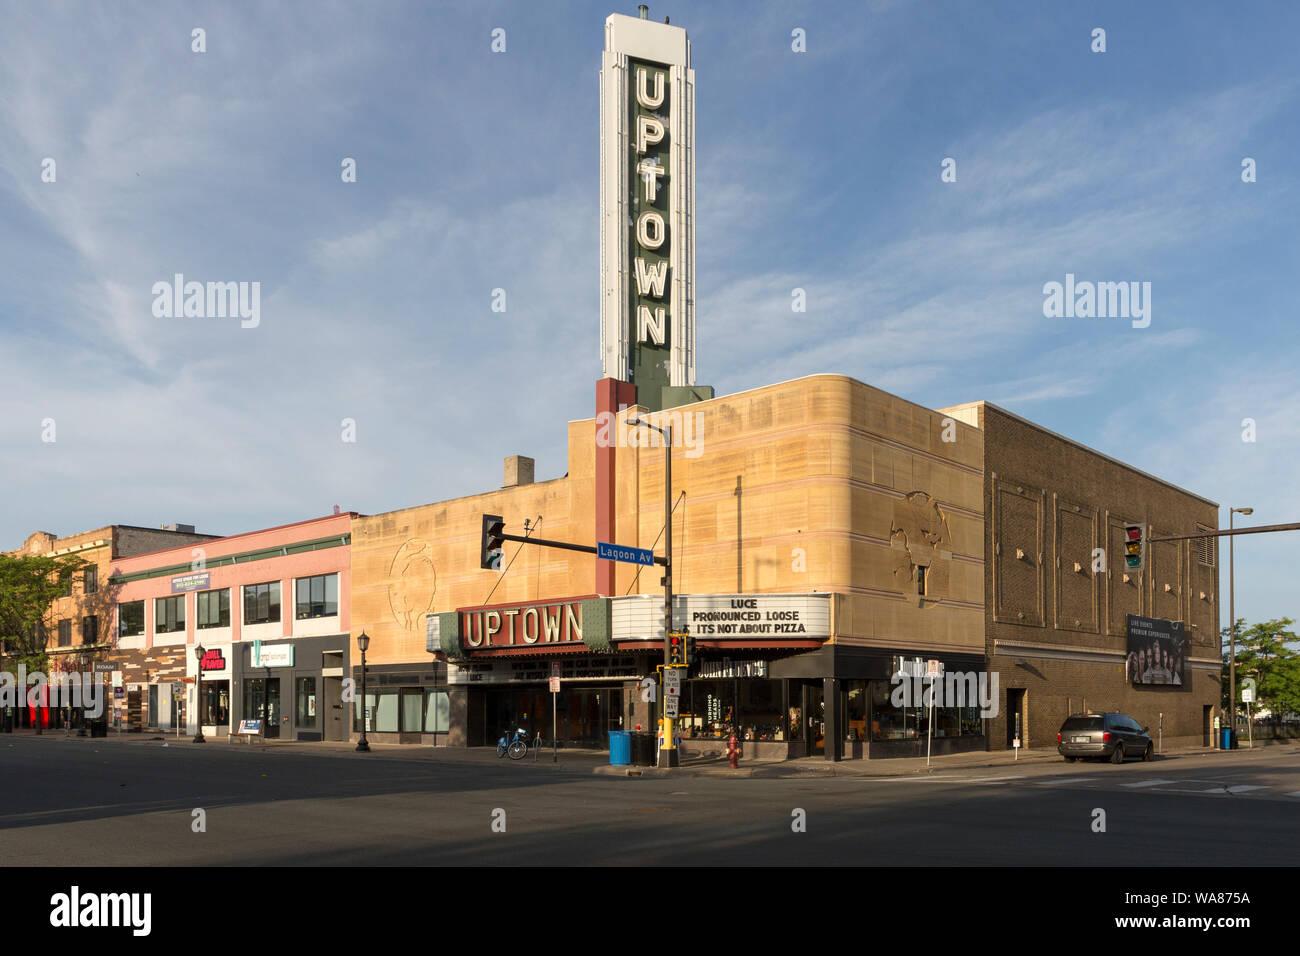 The Streamline Moderne Art Deco exterior of the 1939 Uptown Movie Theater in Minneapolis, Minnesota, USA Stock Photo